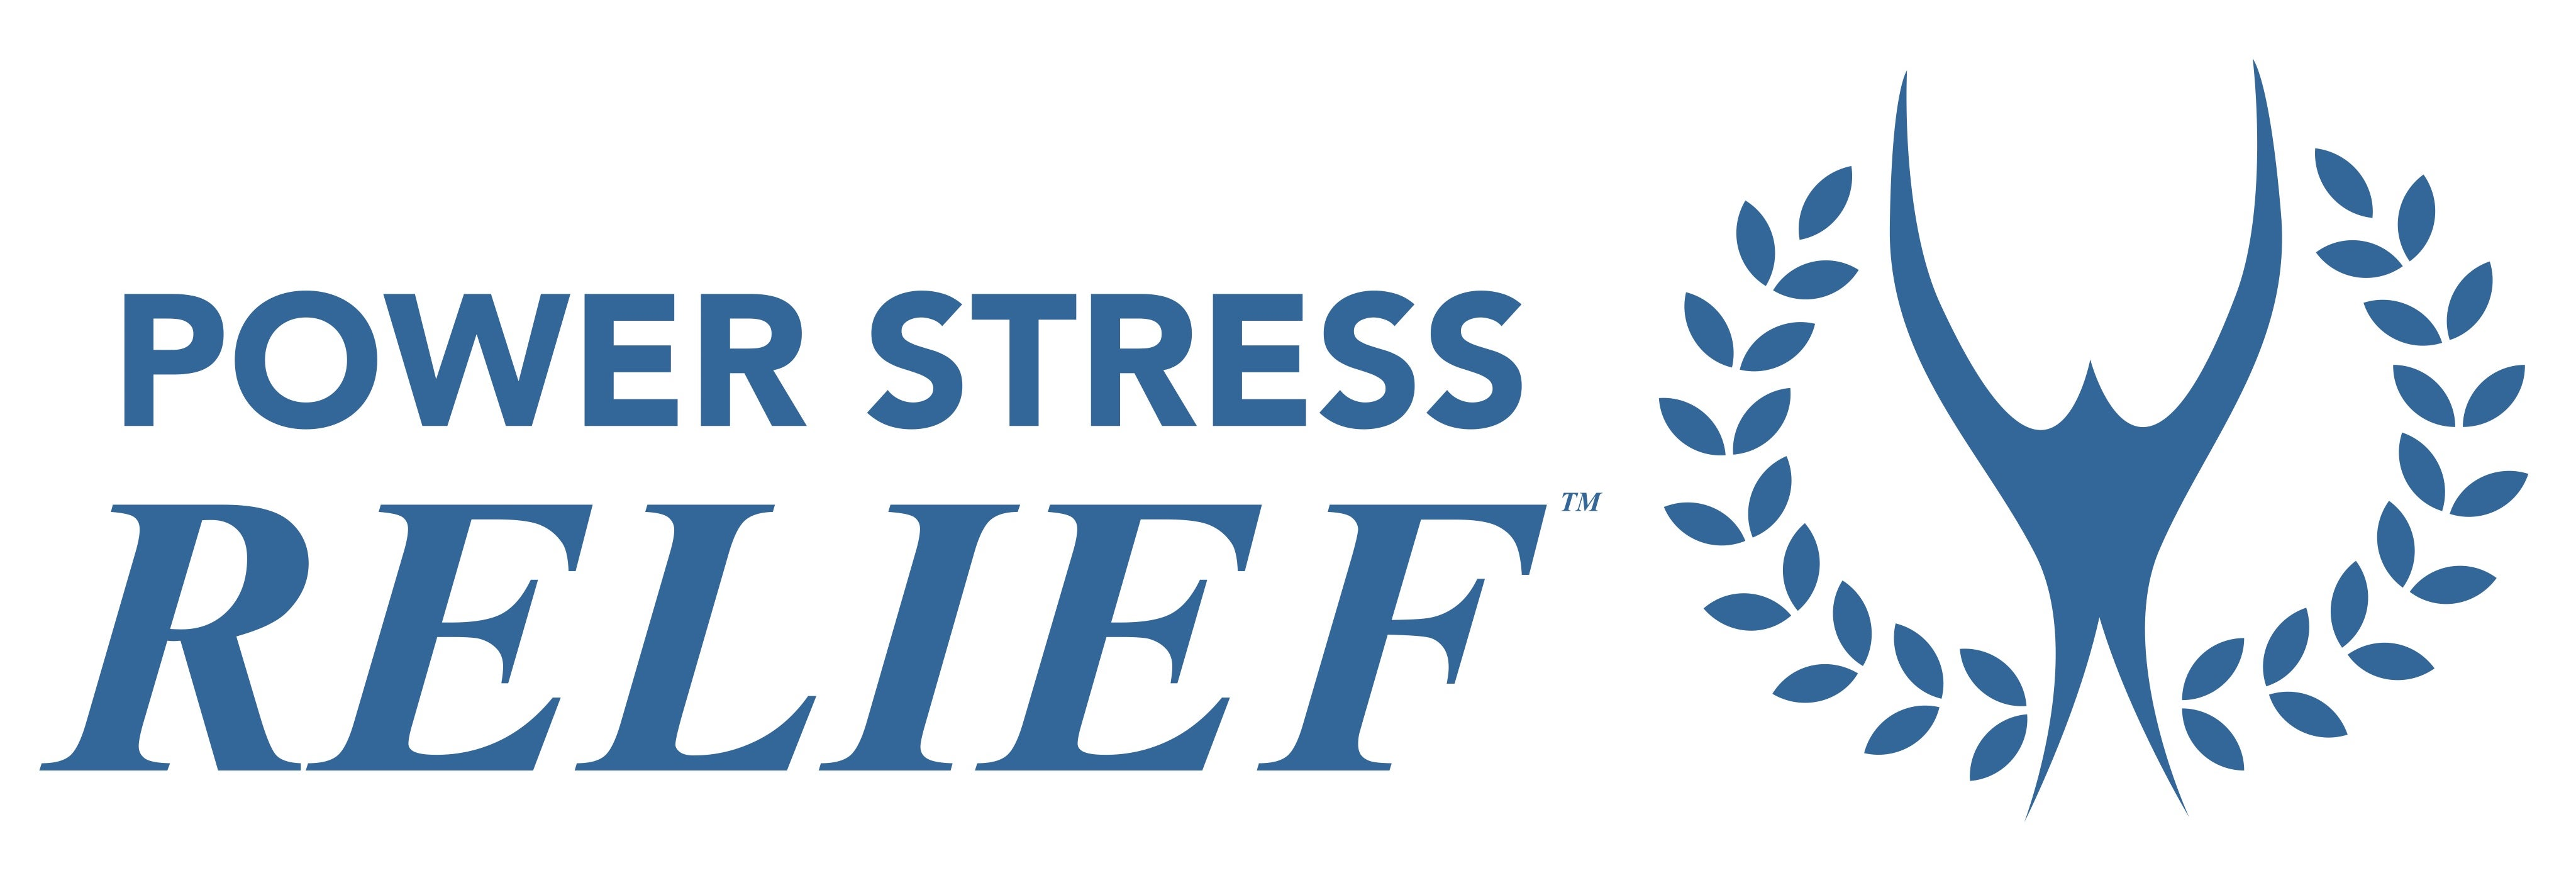 POWER STRESS RELIEF